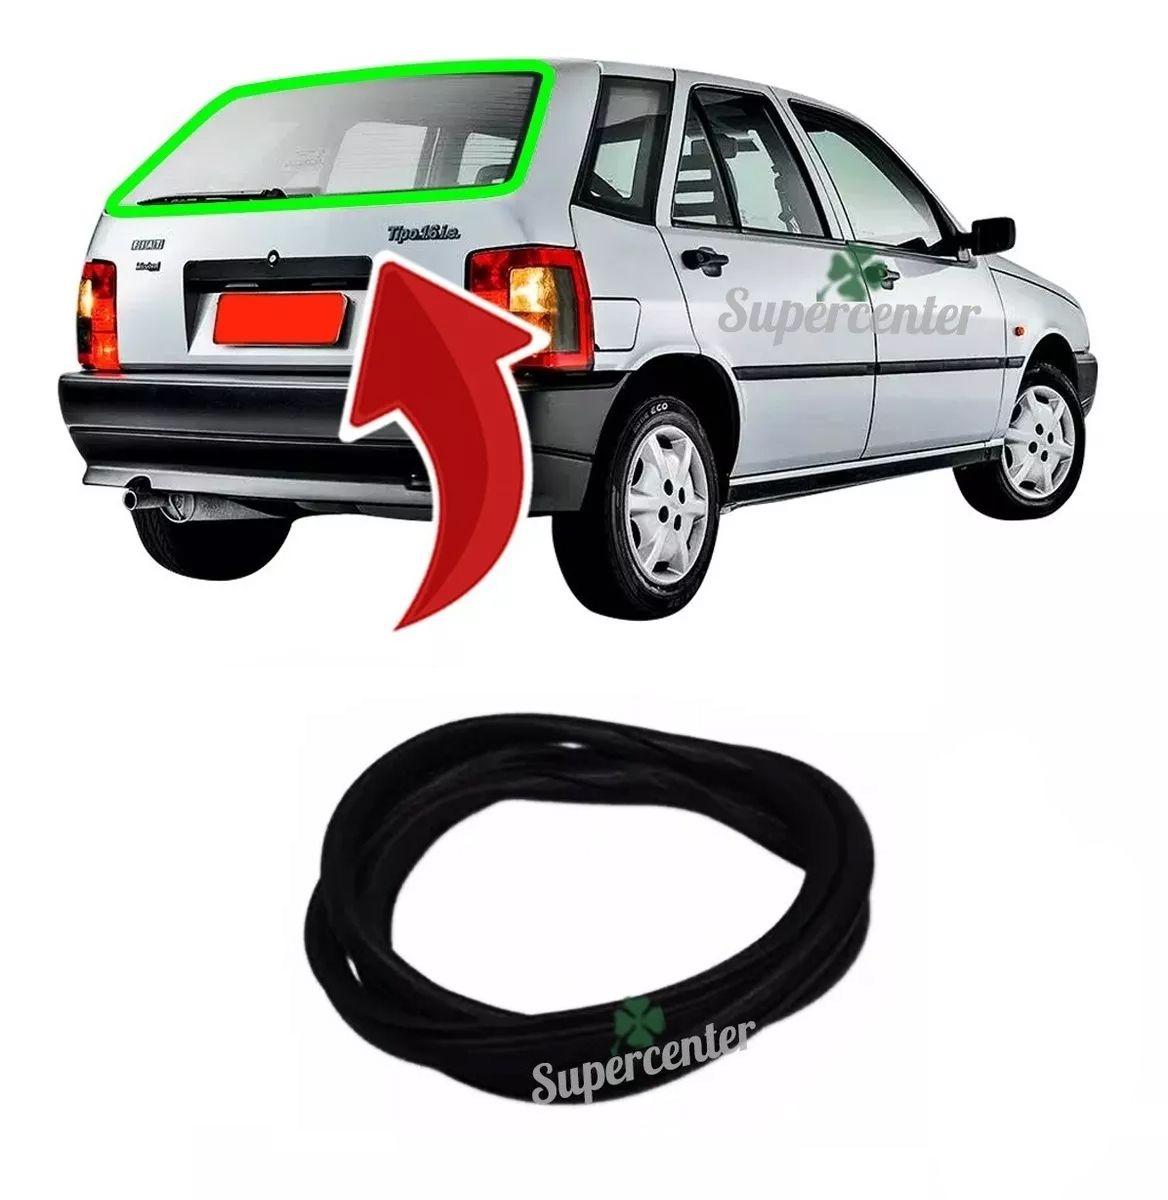 Borracha Arremate Vigia Vidro Traseiro Porta Mala Fiat Tipo